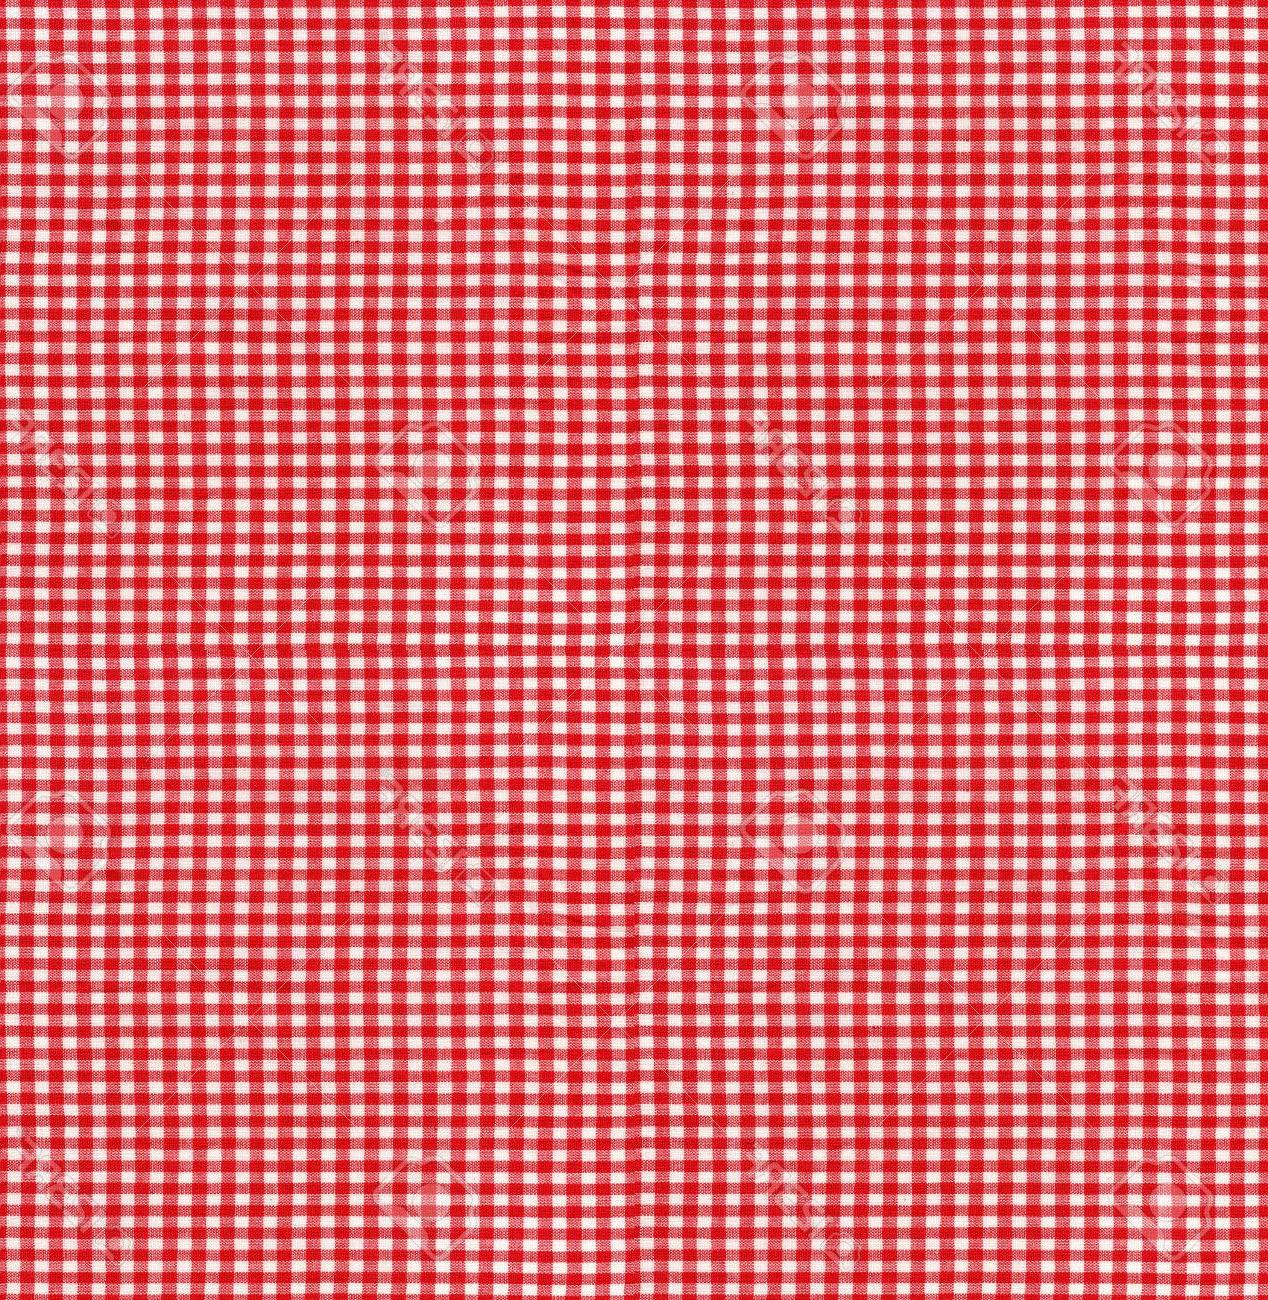 Tela Mantel 9fdy Textura Tileable Inconsútil útil O Fondo Tela Mantel A Cuadros